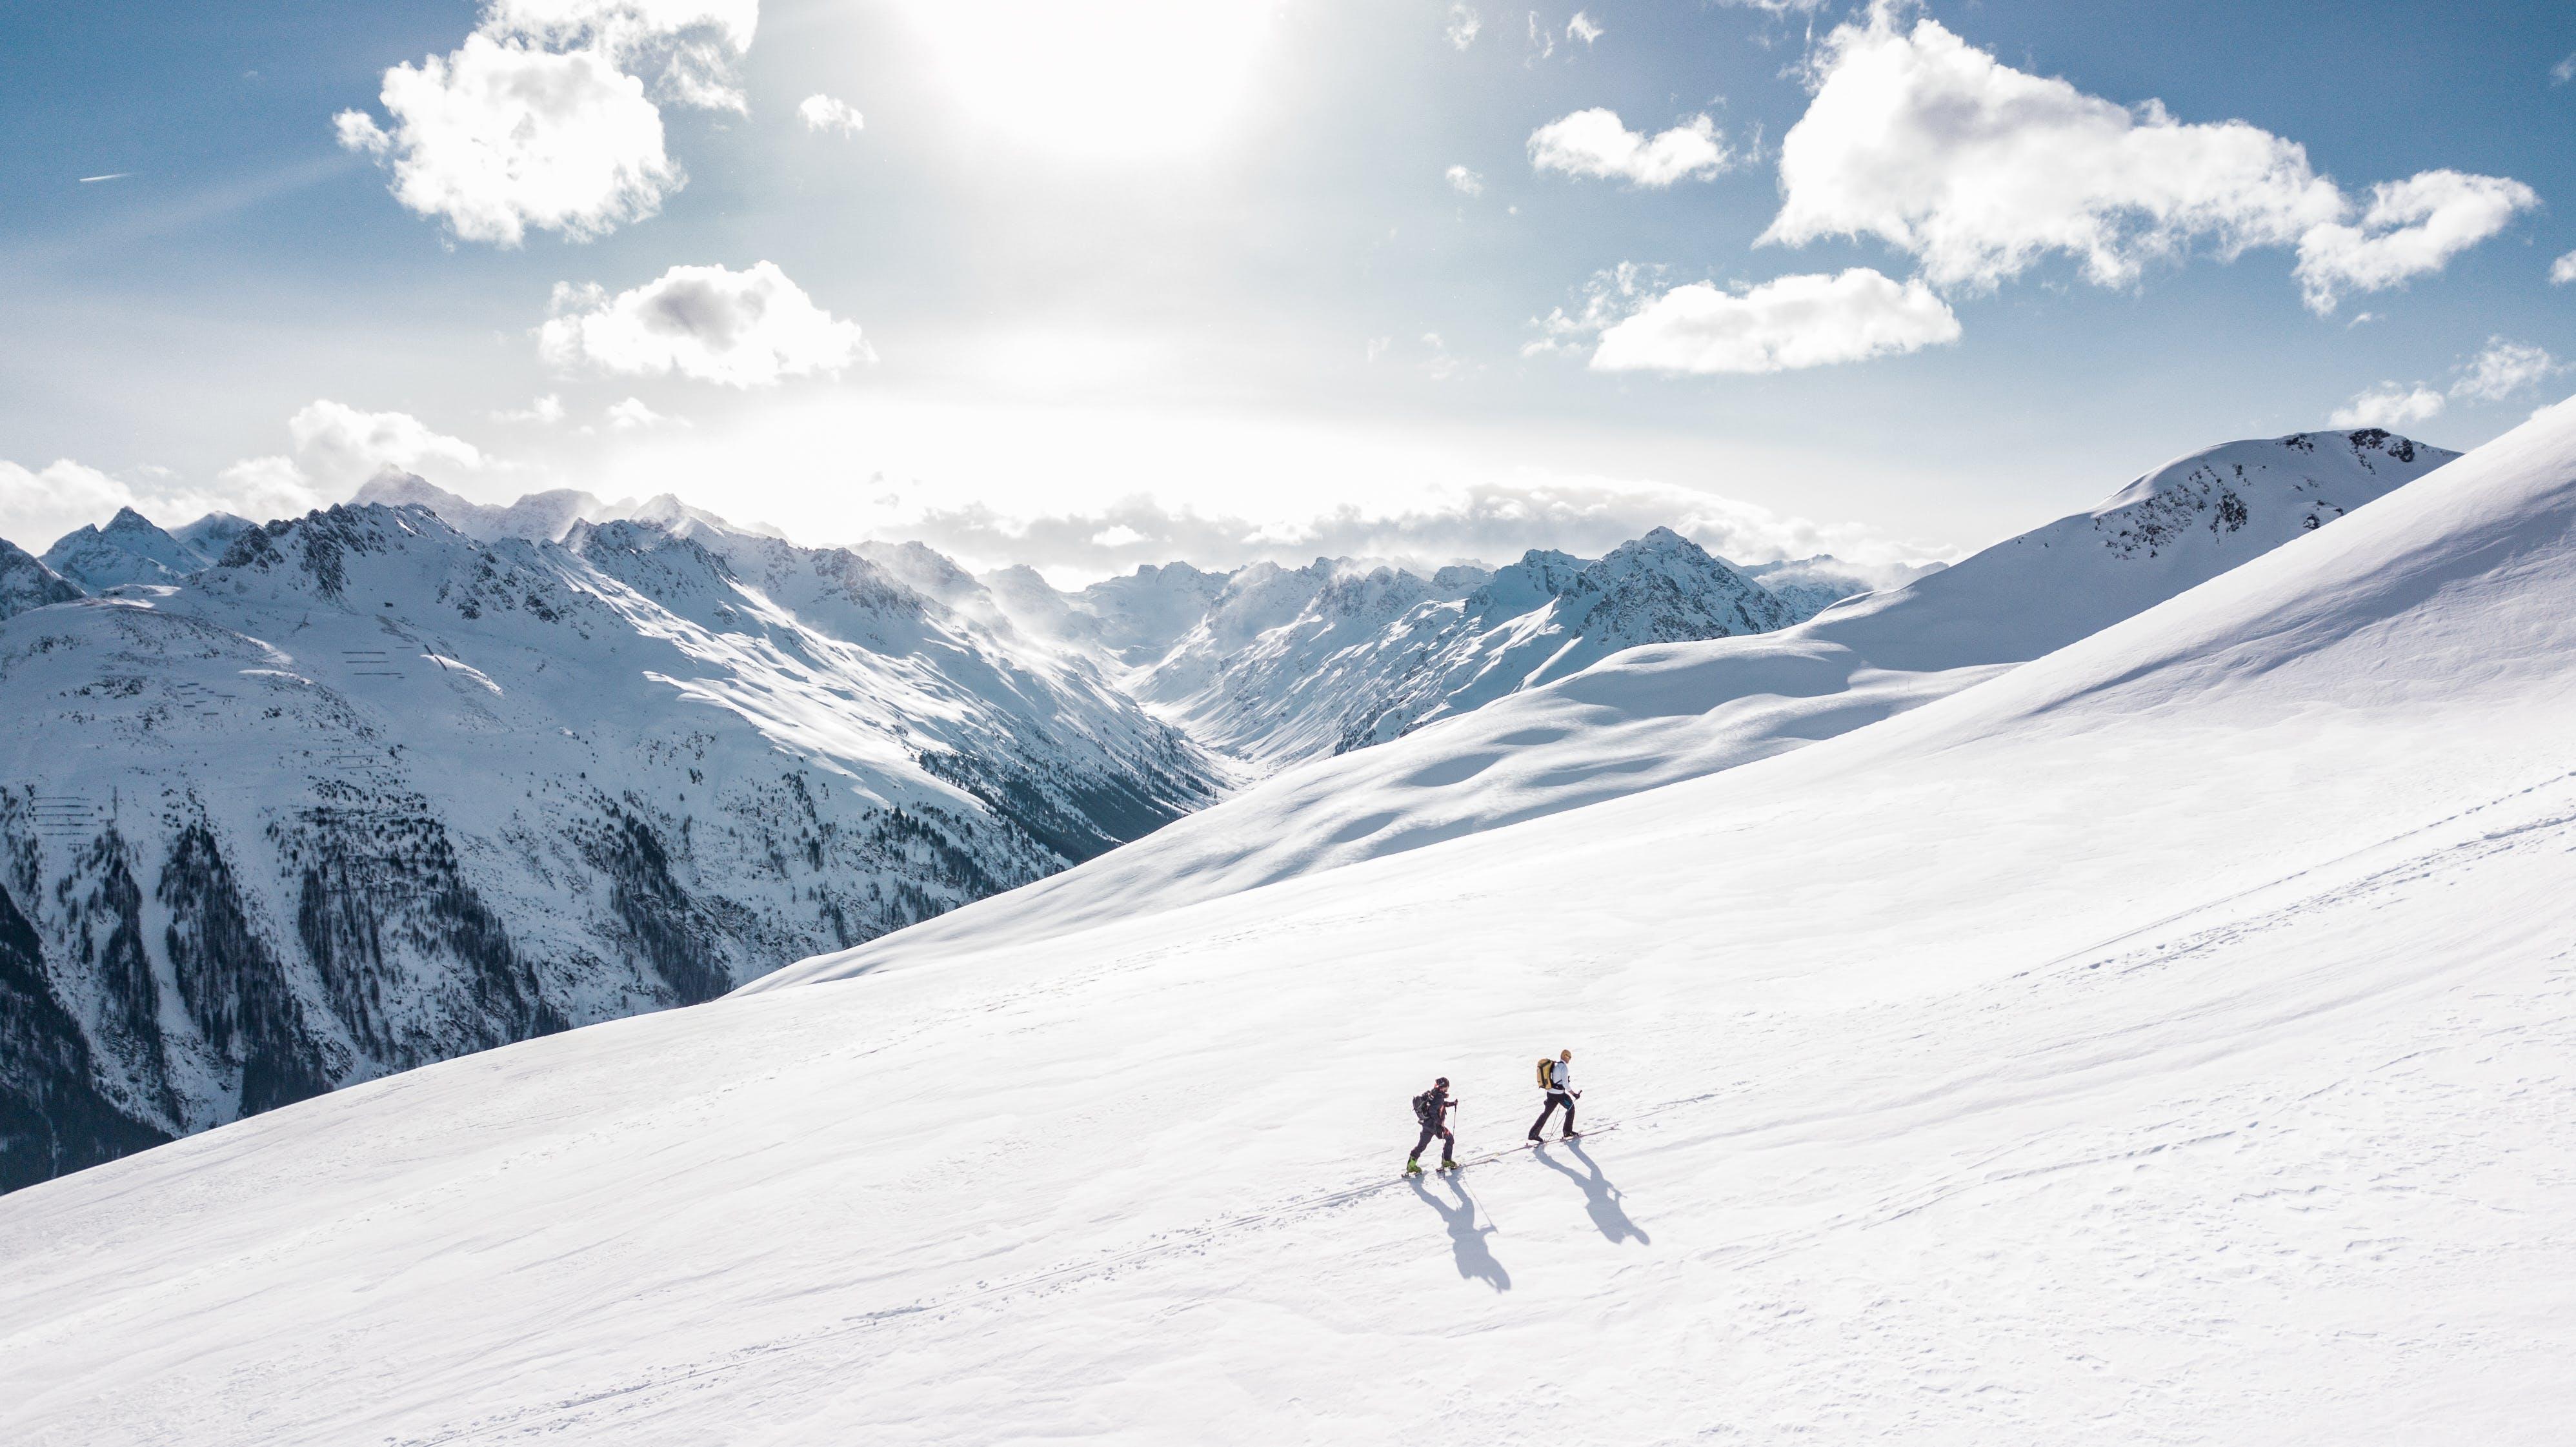 Randonnée à ski (lieu à définir)